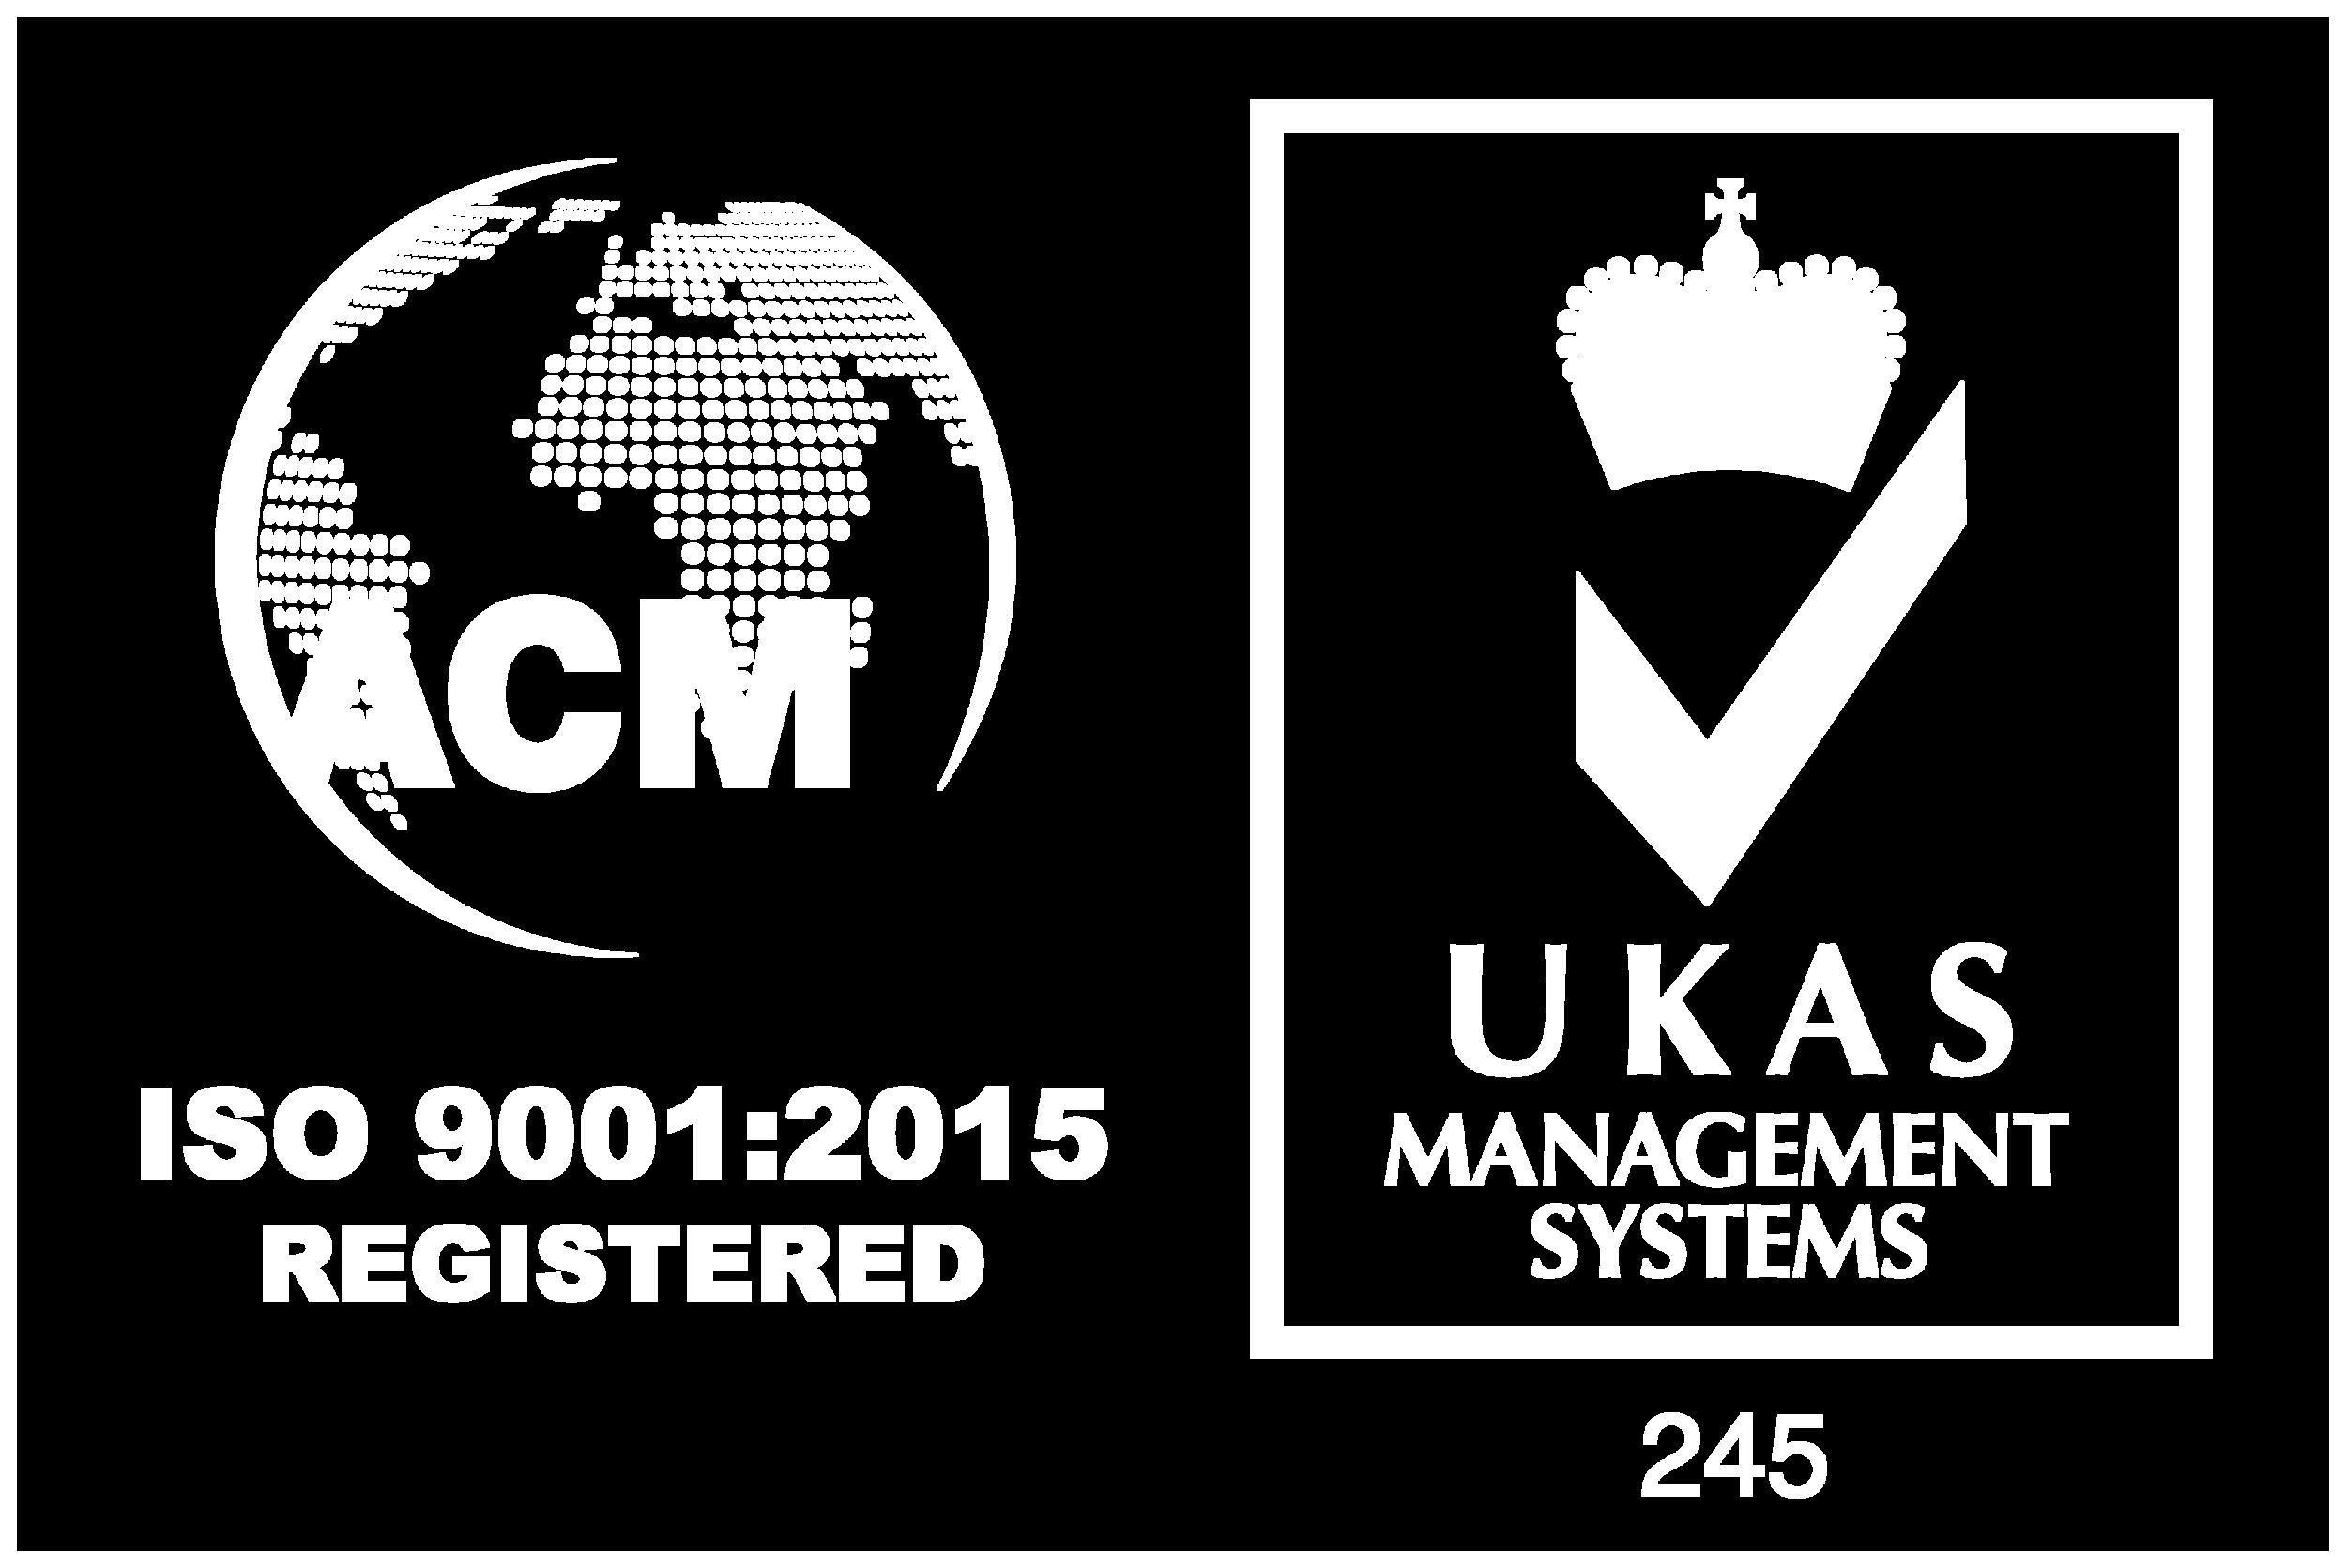 9001 ACM UKAS Logo2.png